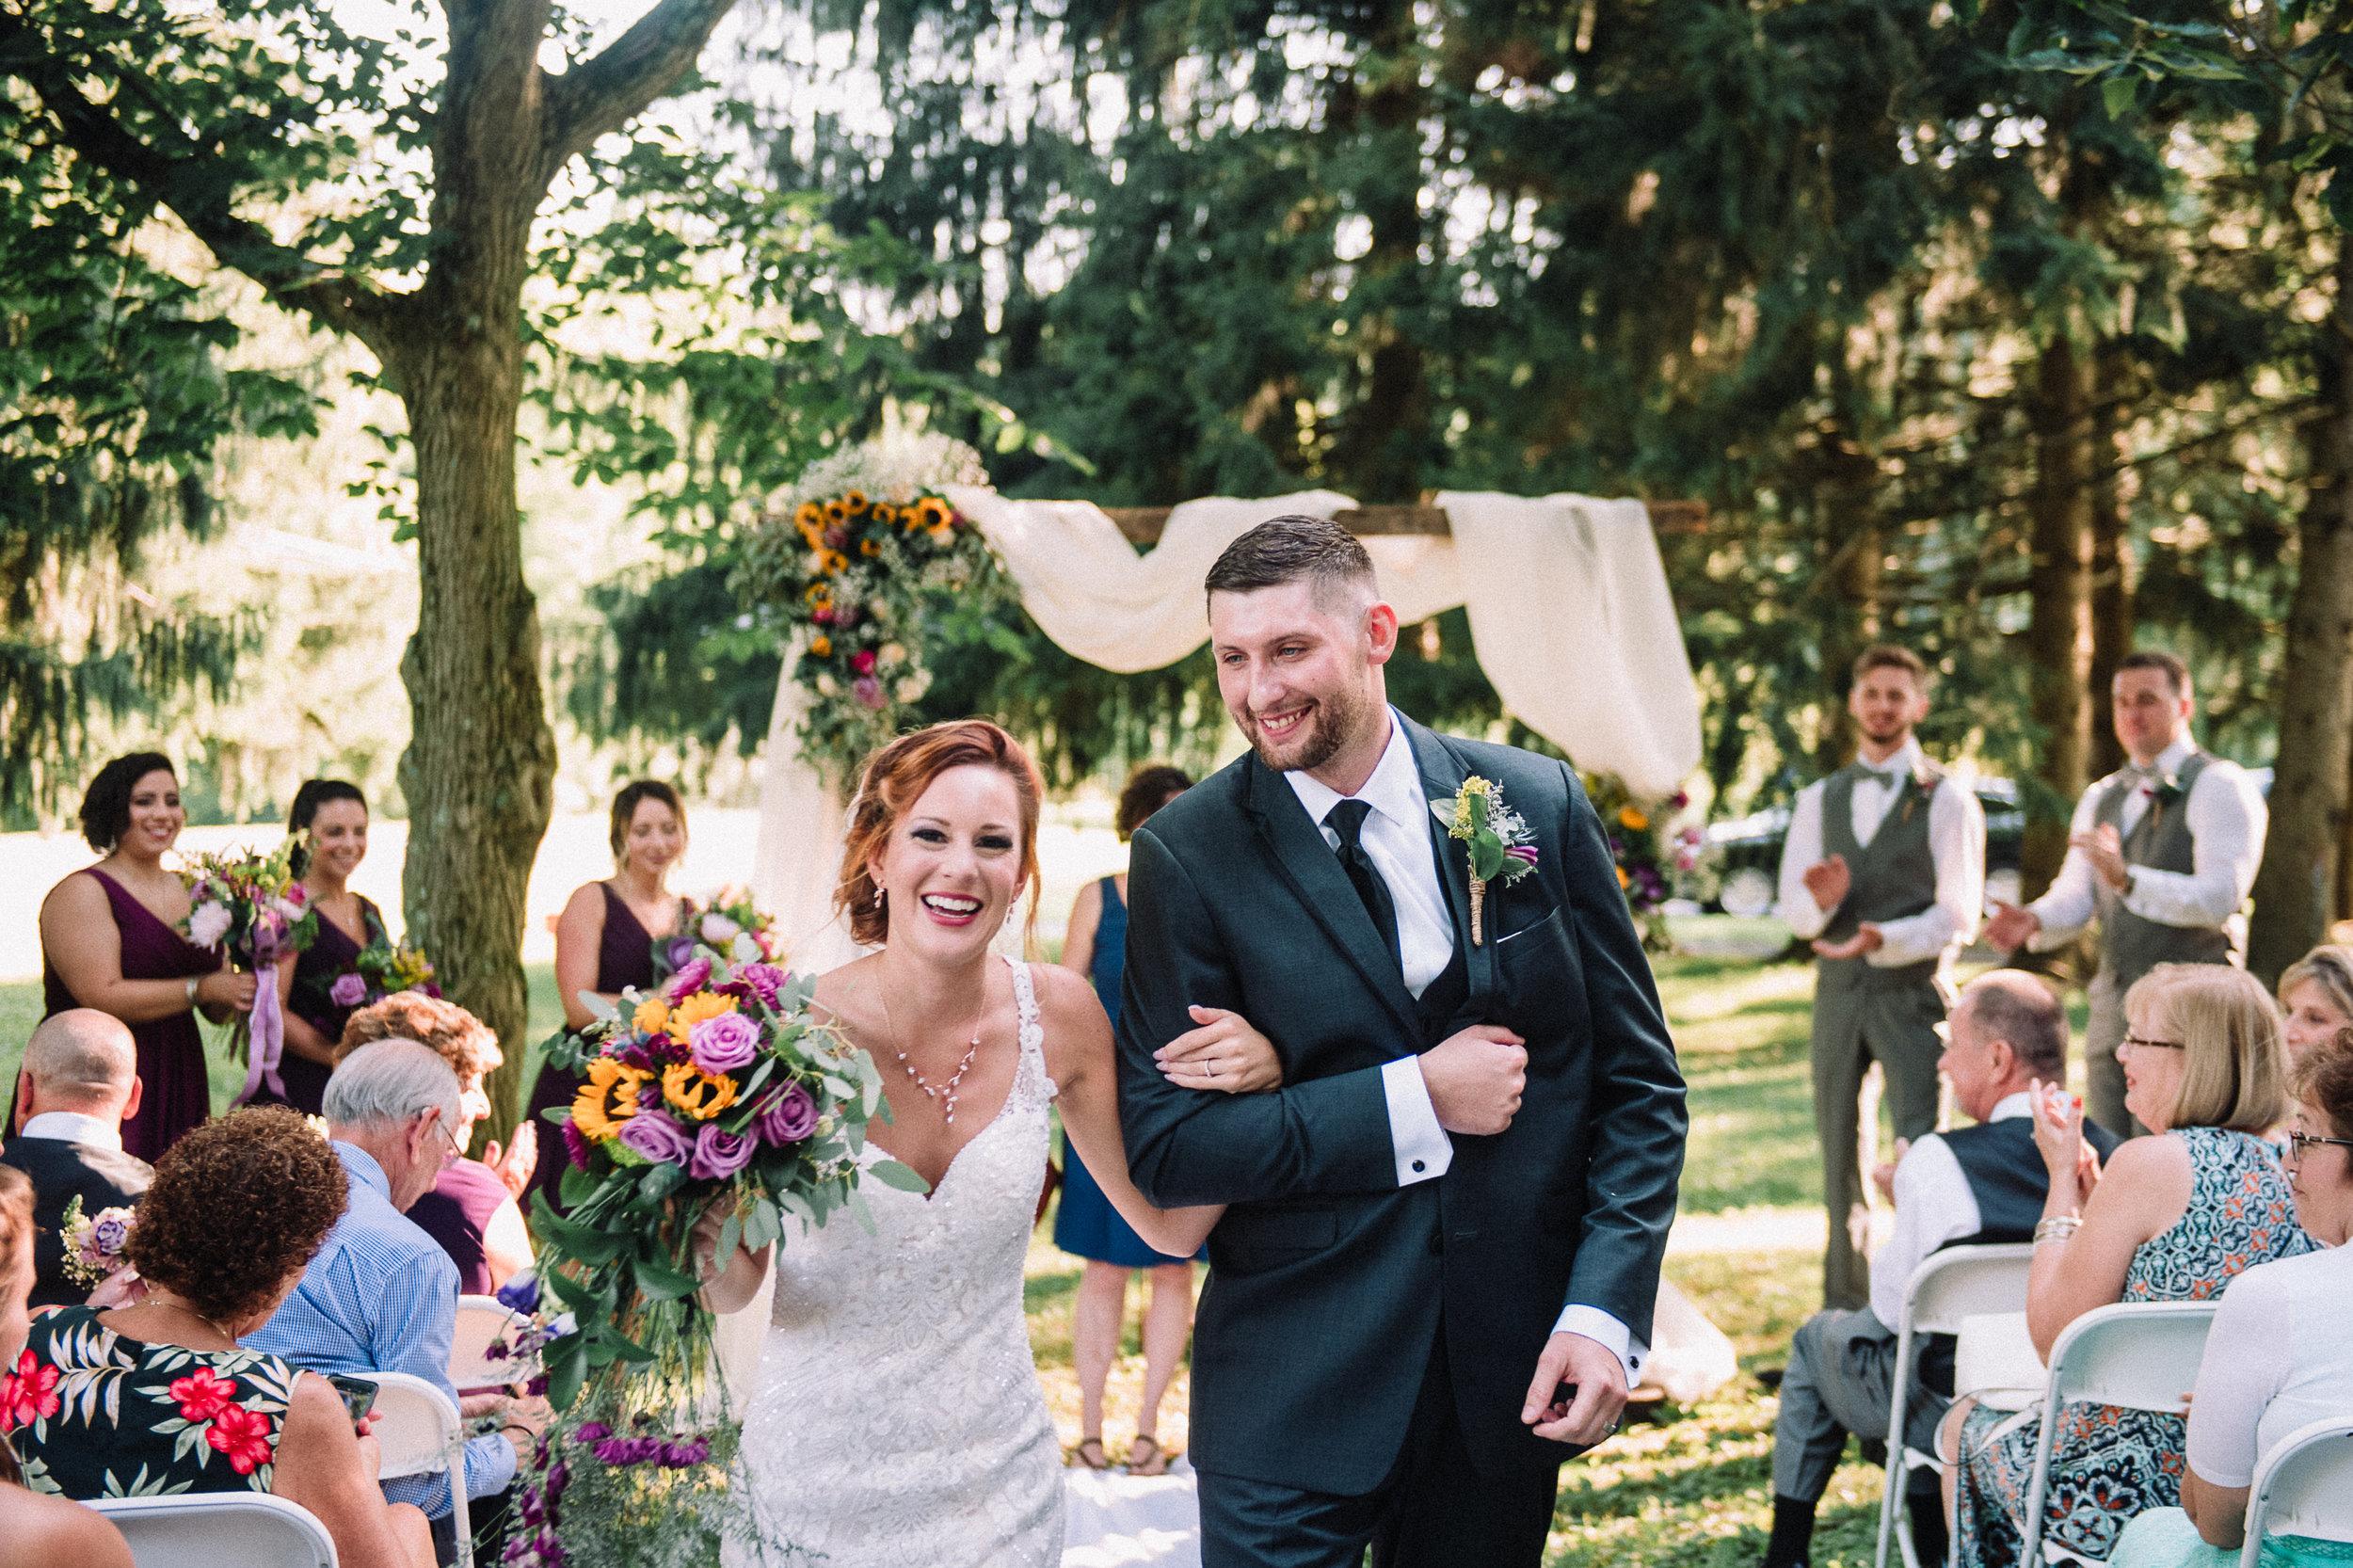 061ninalilyphoto-groveatkemptonwedding-hicksblog.jpg